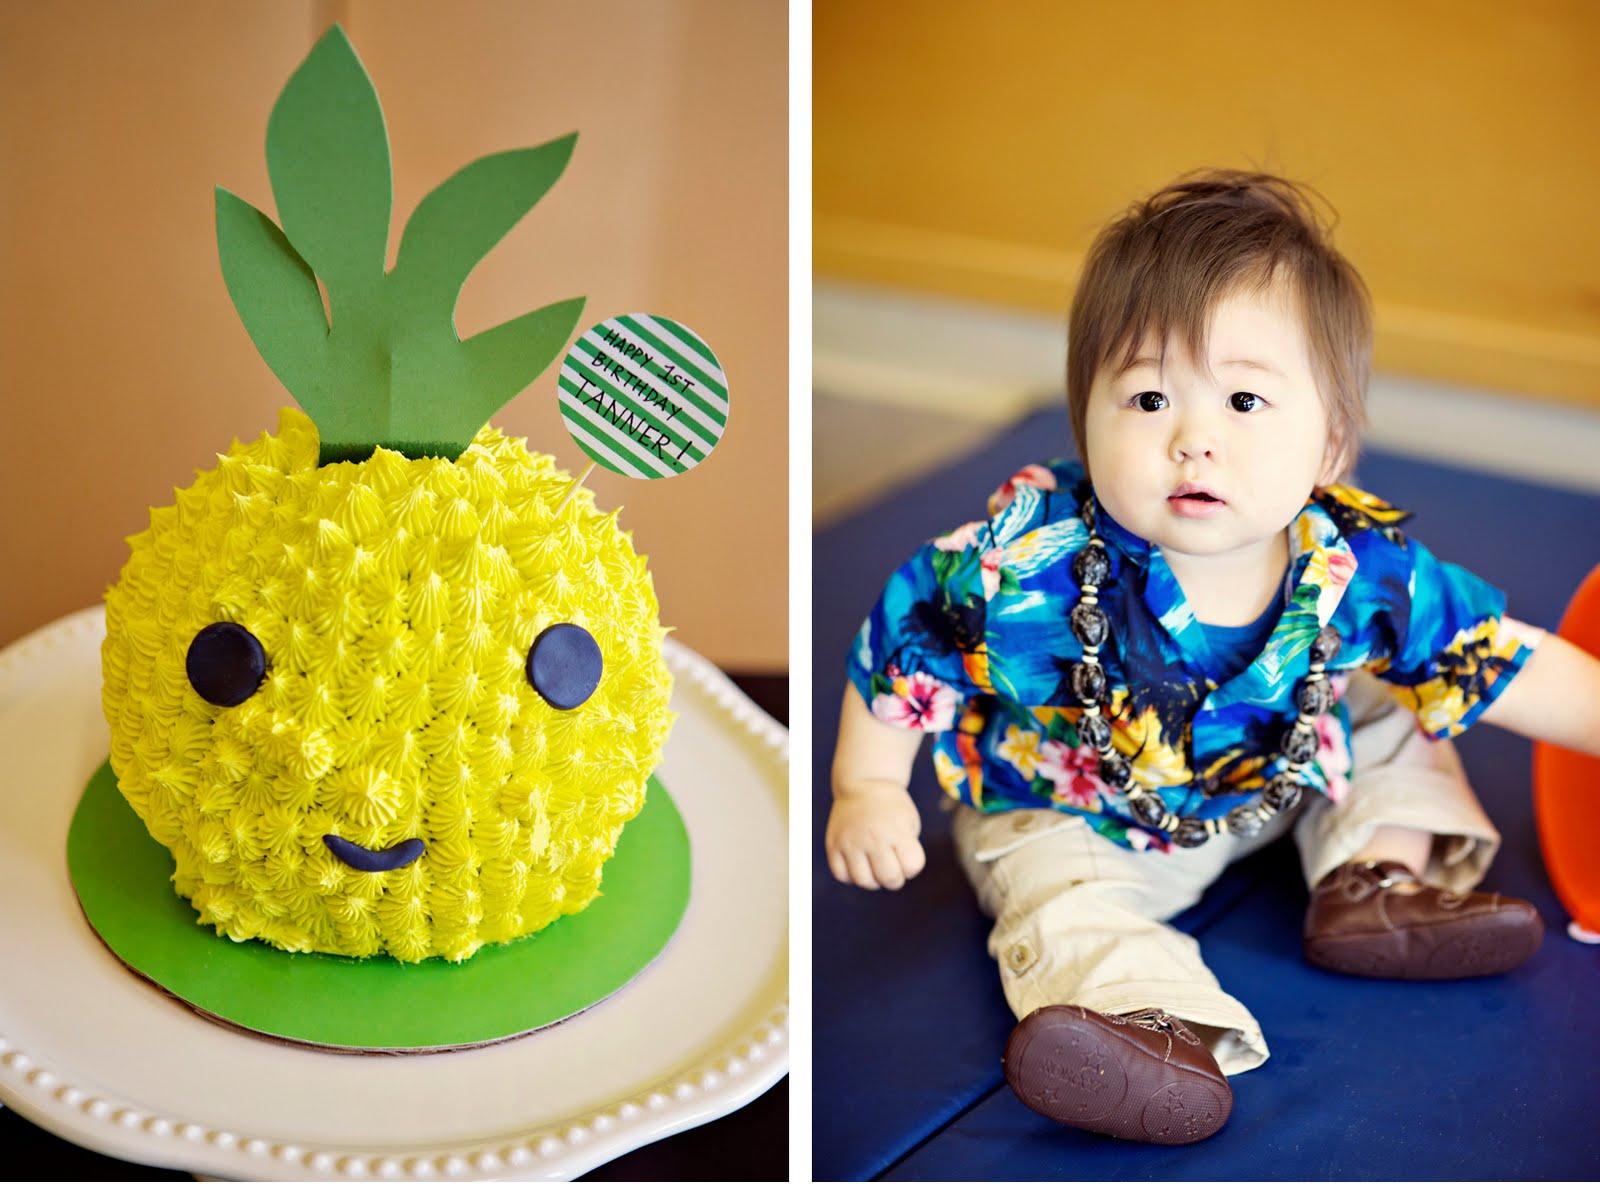 Tanner S Hawaiian 1st Birthday Bash Pineapple Head Cake